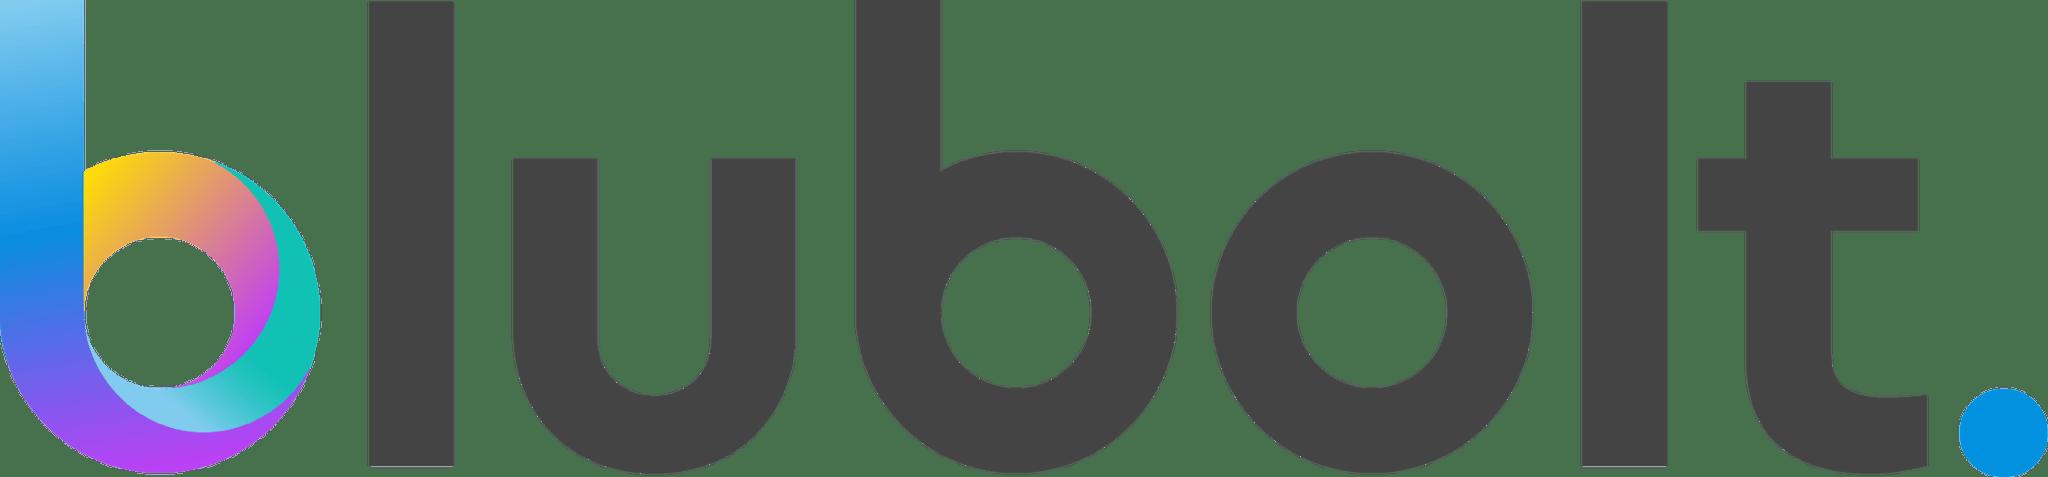 blubolt